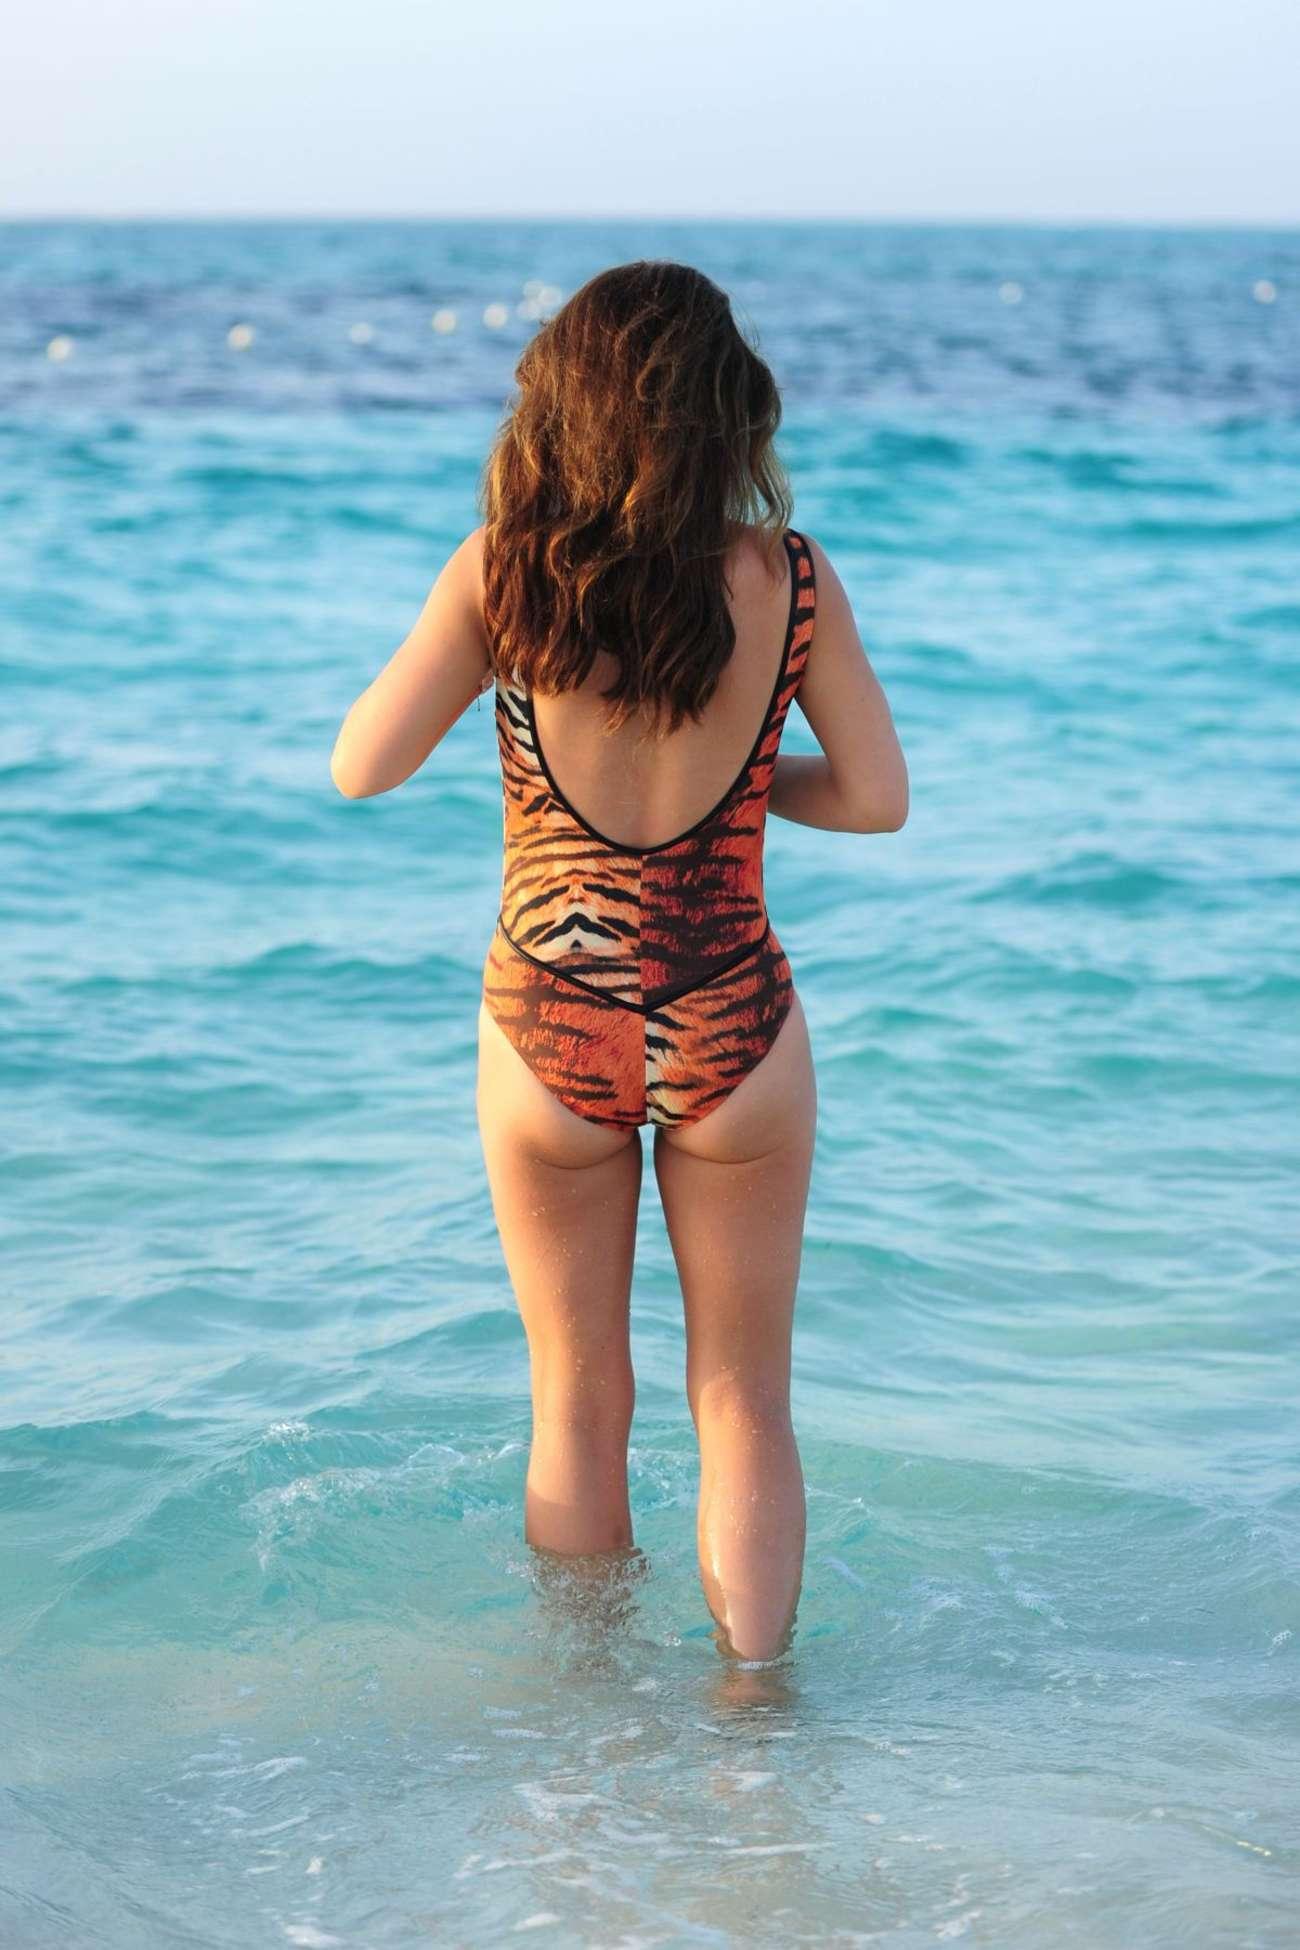 Tammin Sursok 2015 : Tammin Sursok in Bikinis -05